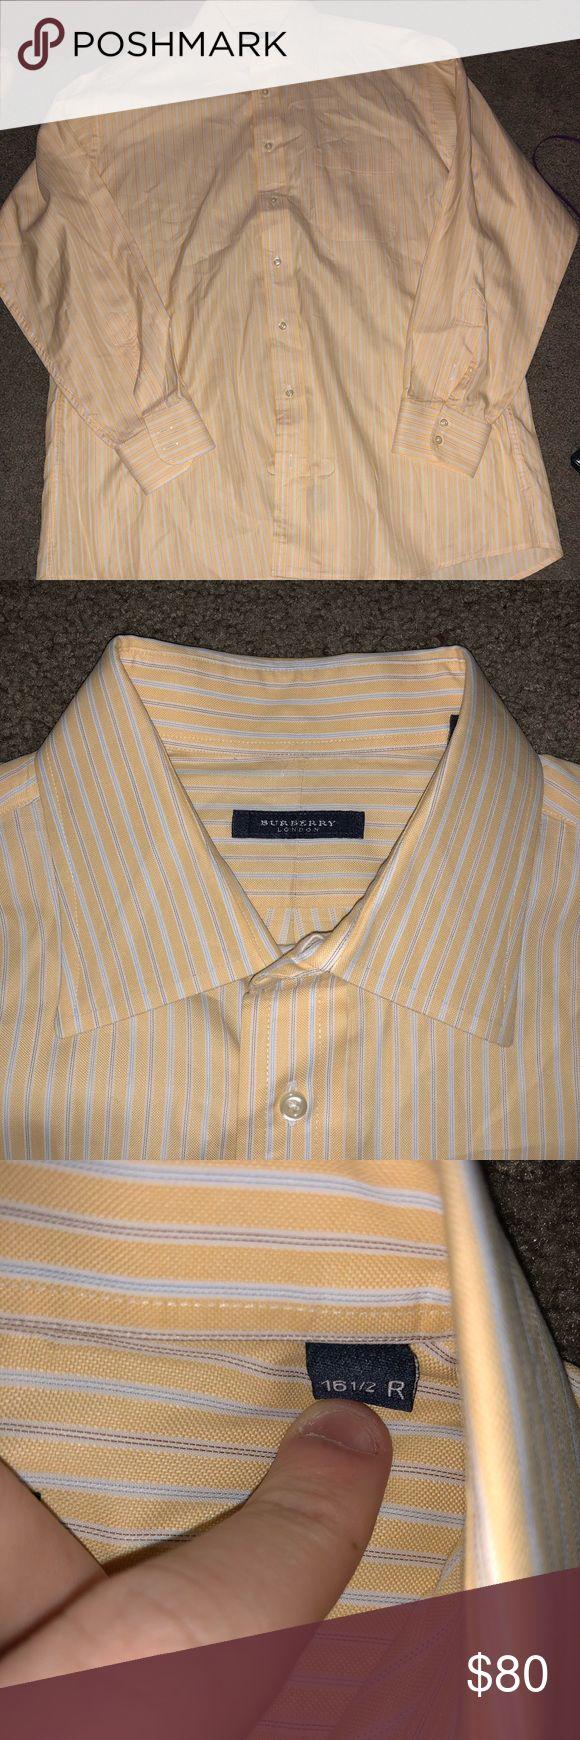 Burberry London Size 16.5 men's dress shirt Men's Burberry London dress shirt that is in excellent condition. Burberry Shirts Dress Shirts